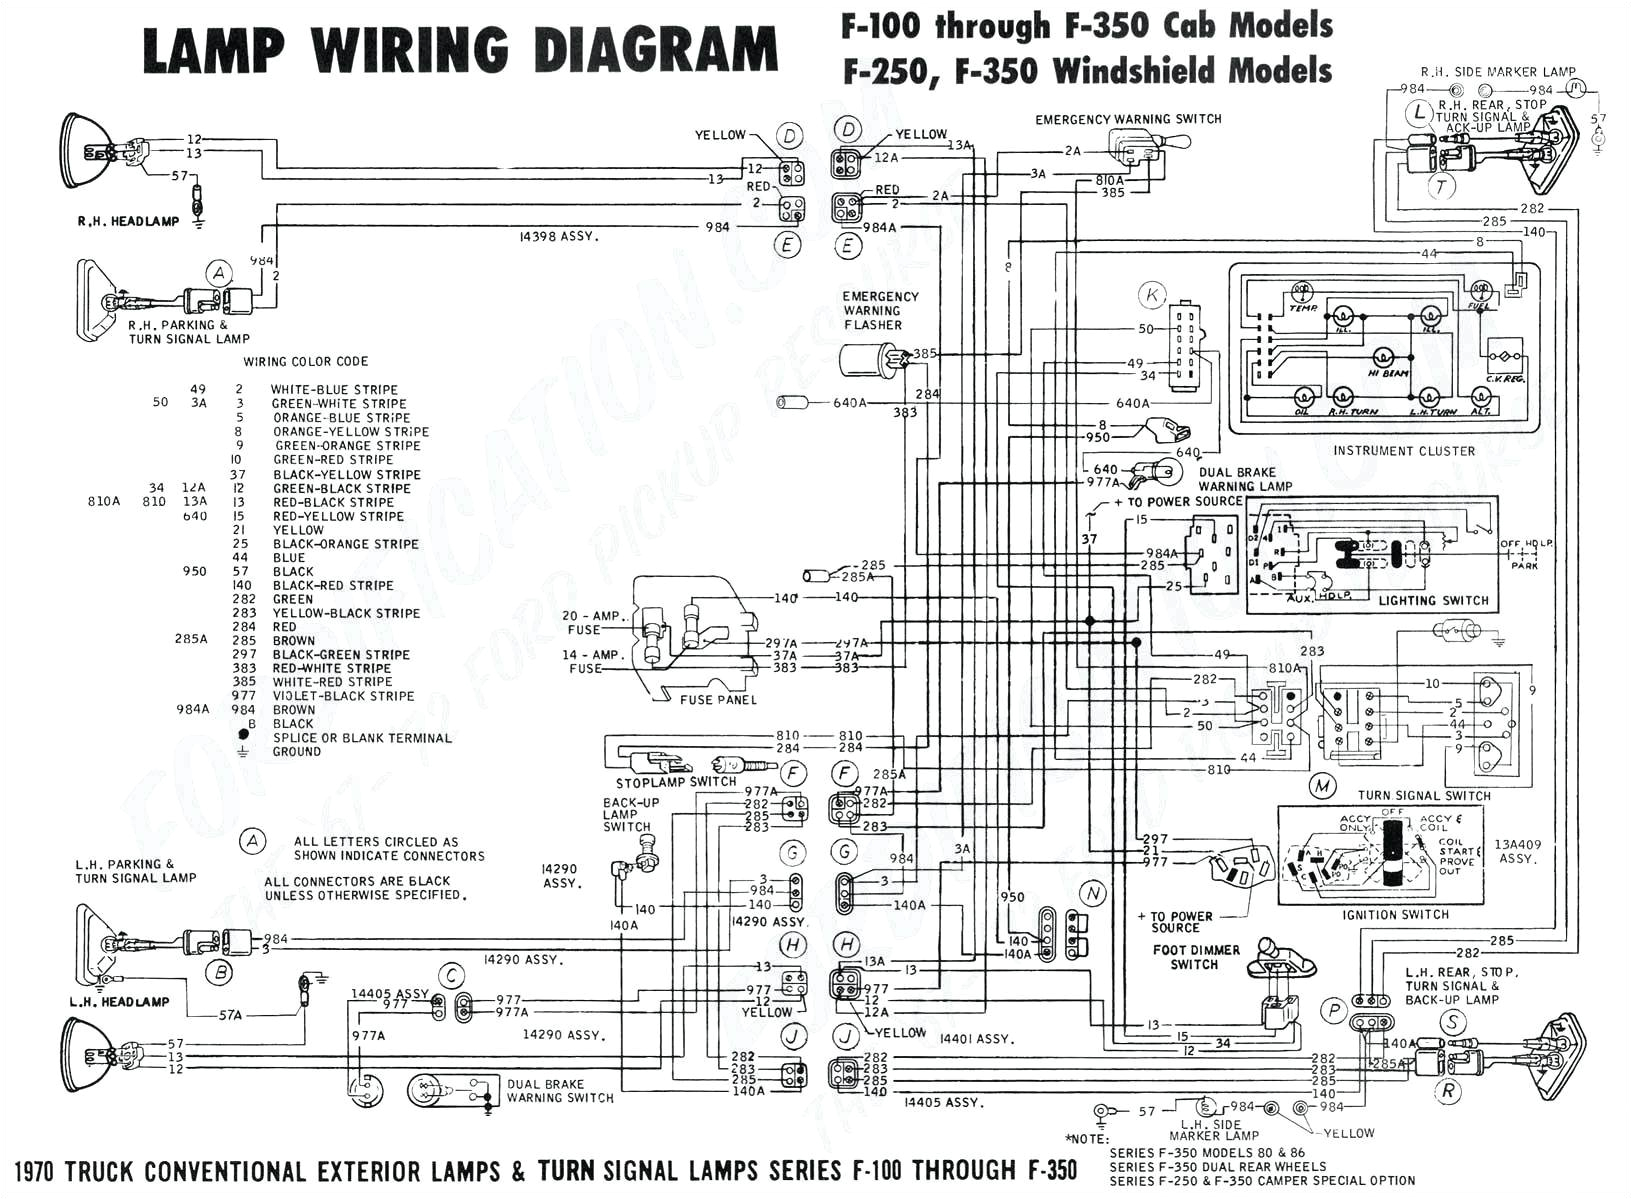 wiring diagram car sn club 48v 5035896 wiring diagram expert cps wiring harness wiring diagram data